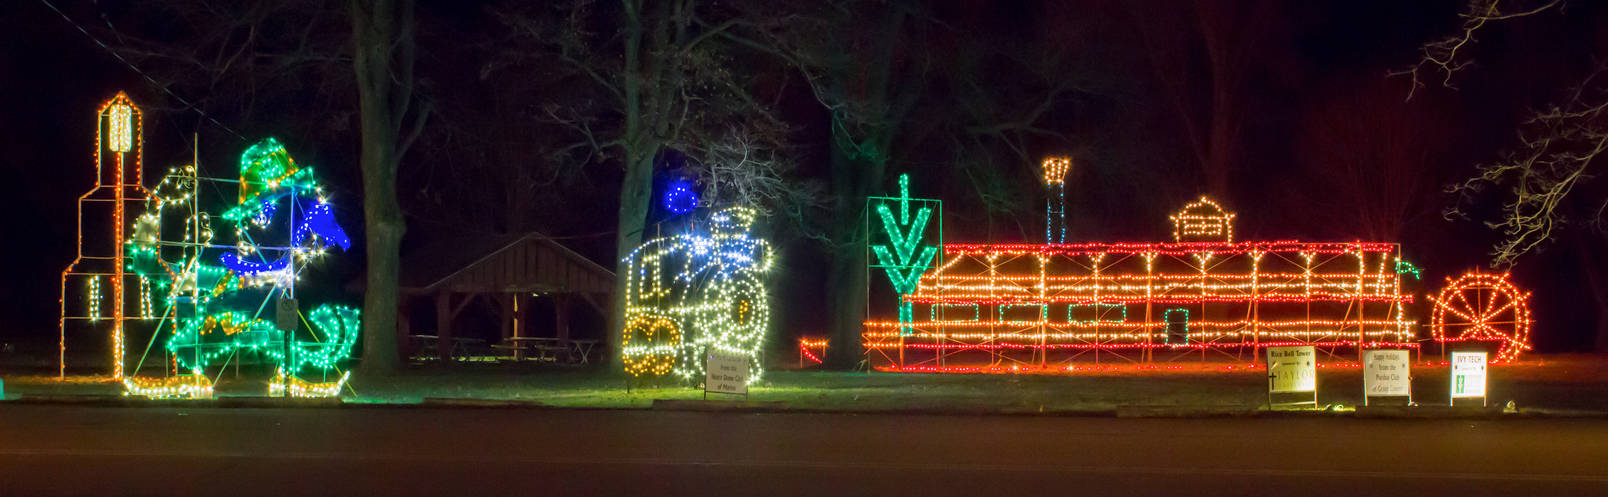 Christmas Lights Marion Indiana By Devonjones